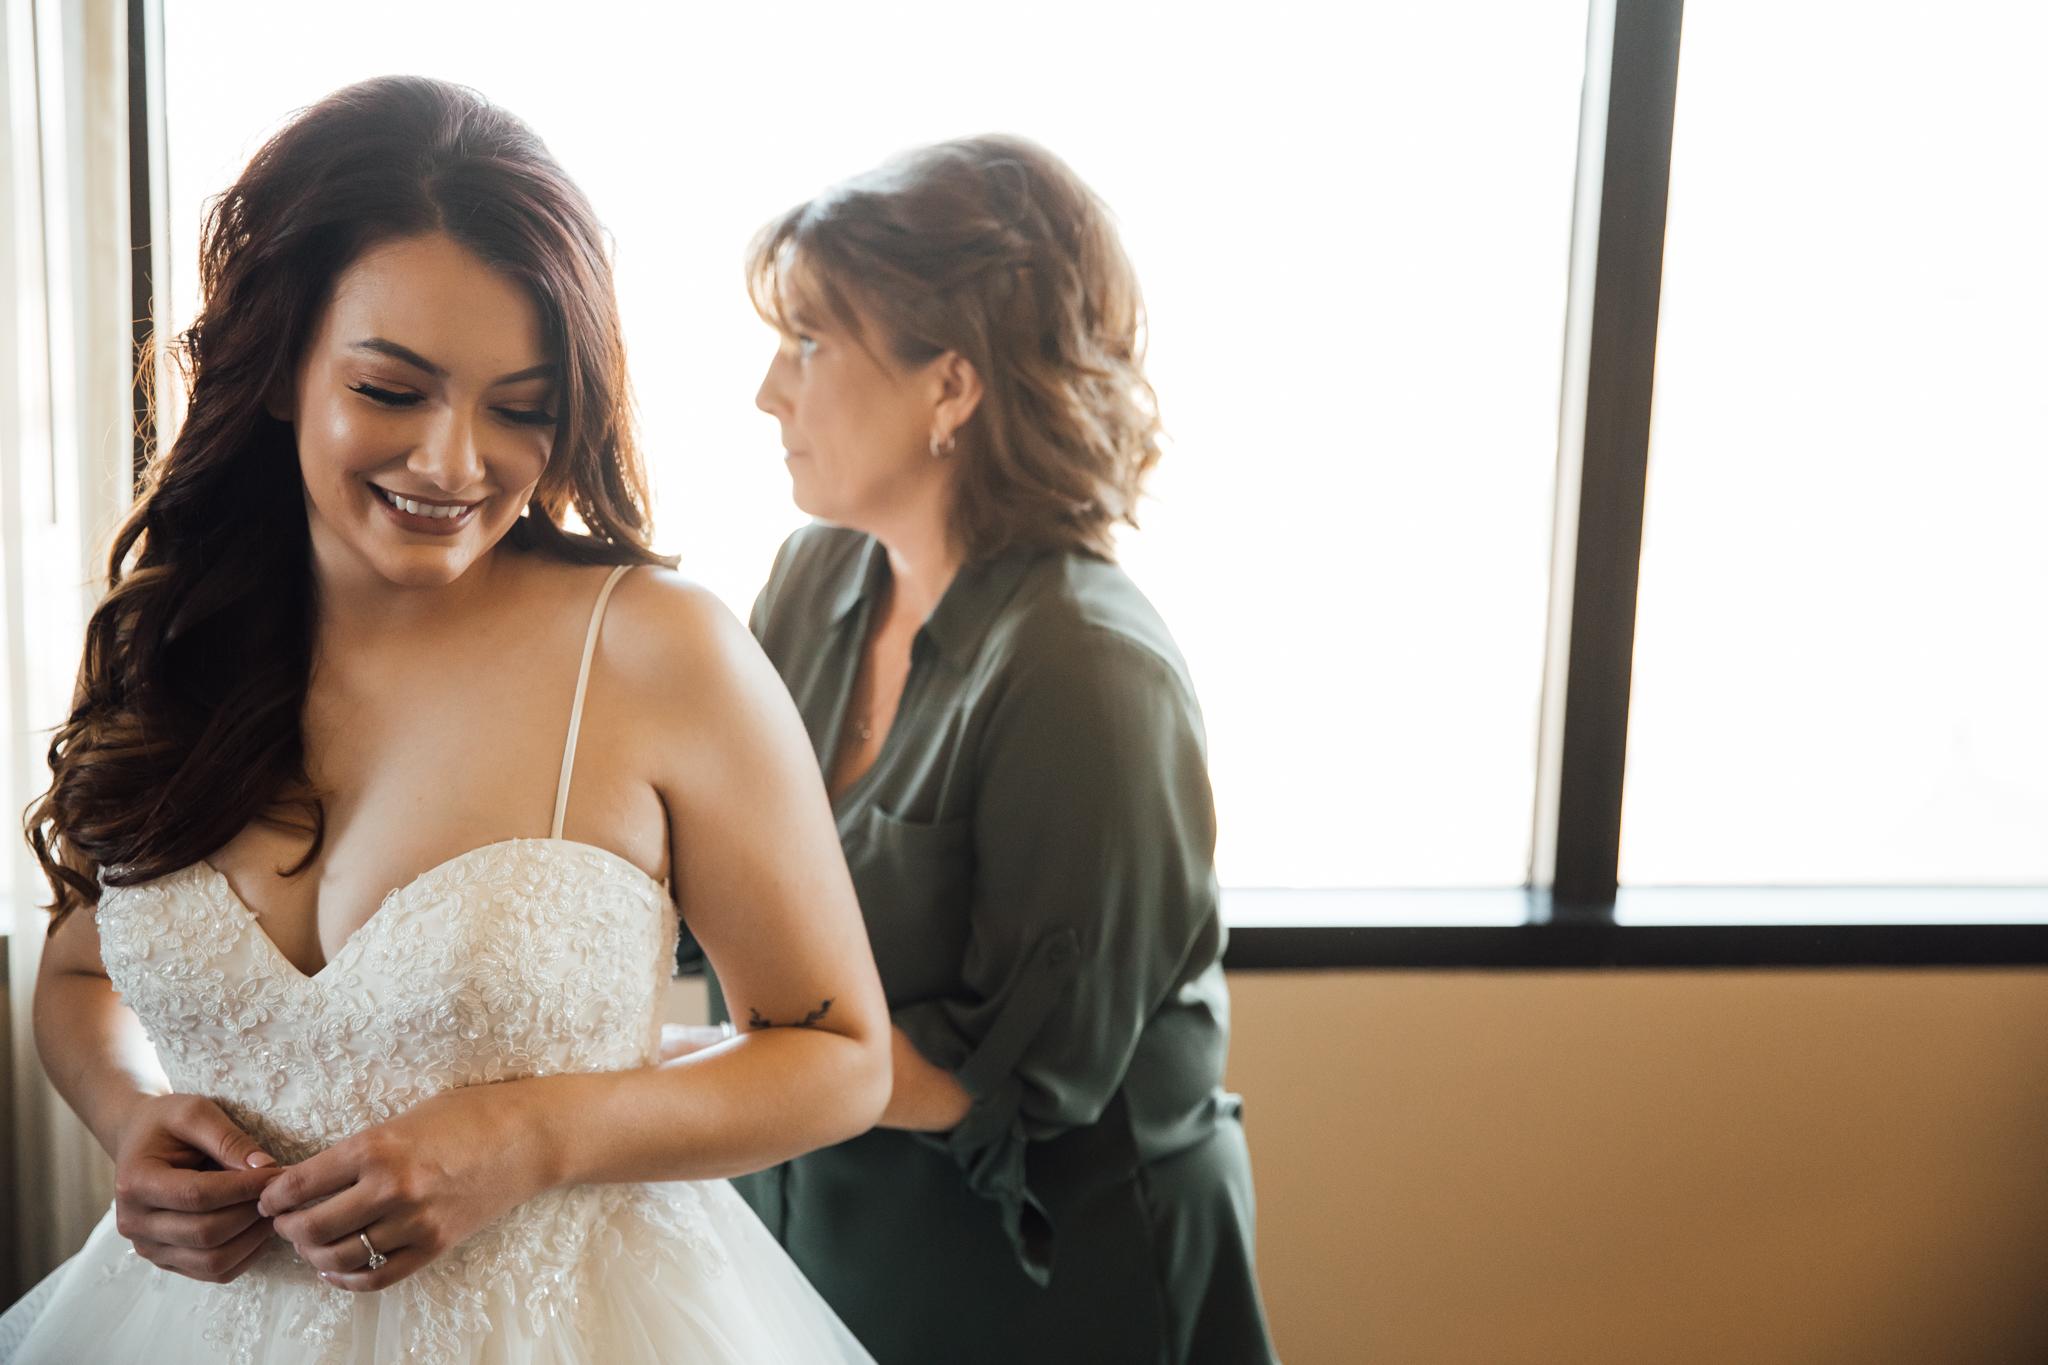 memphis-wedding-photographers-thewarmtharoundyou-ballinese-ballroom (30 of 232).jpg